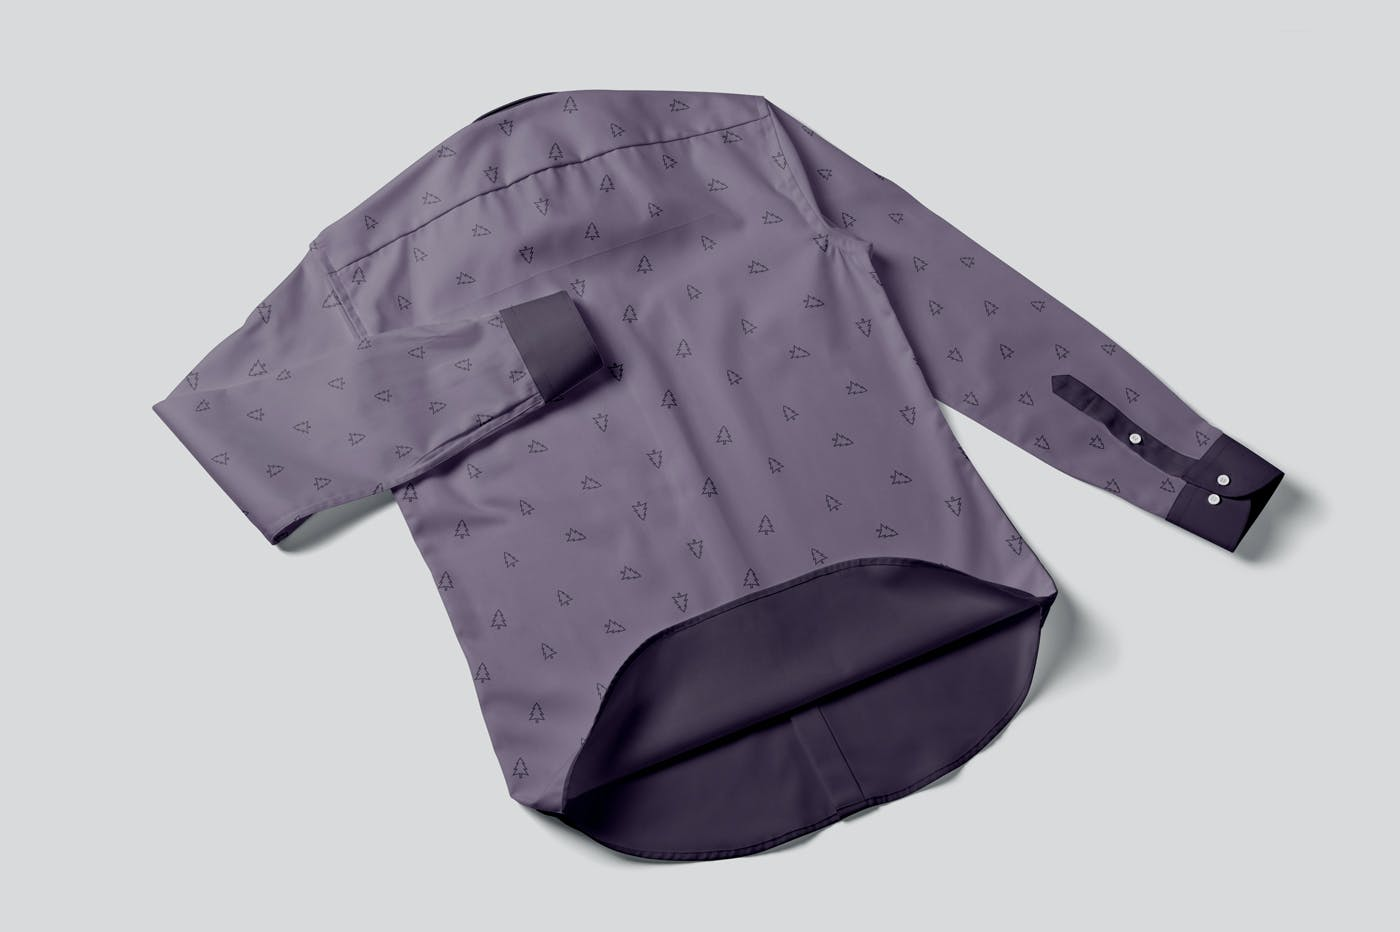 男士纽扣衬衫印花设计PS贴图样机模板 Button Up Shirt For Men Mockups插图5